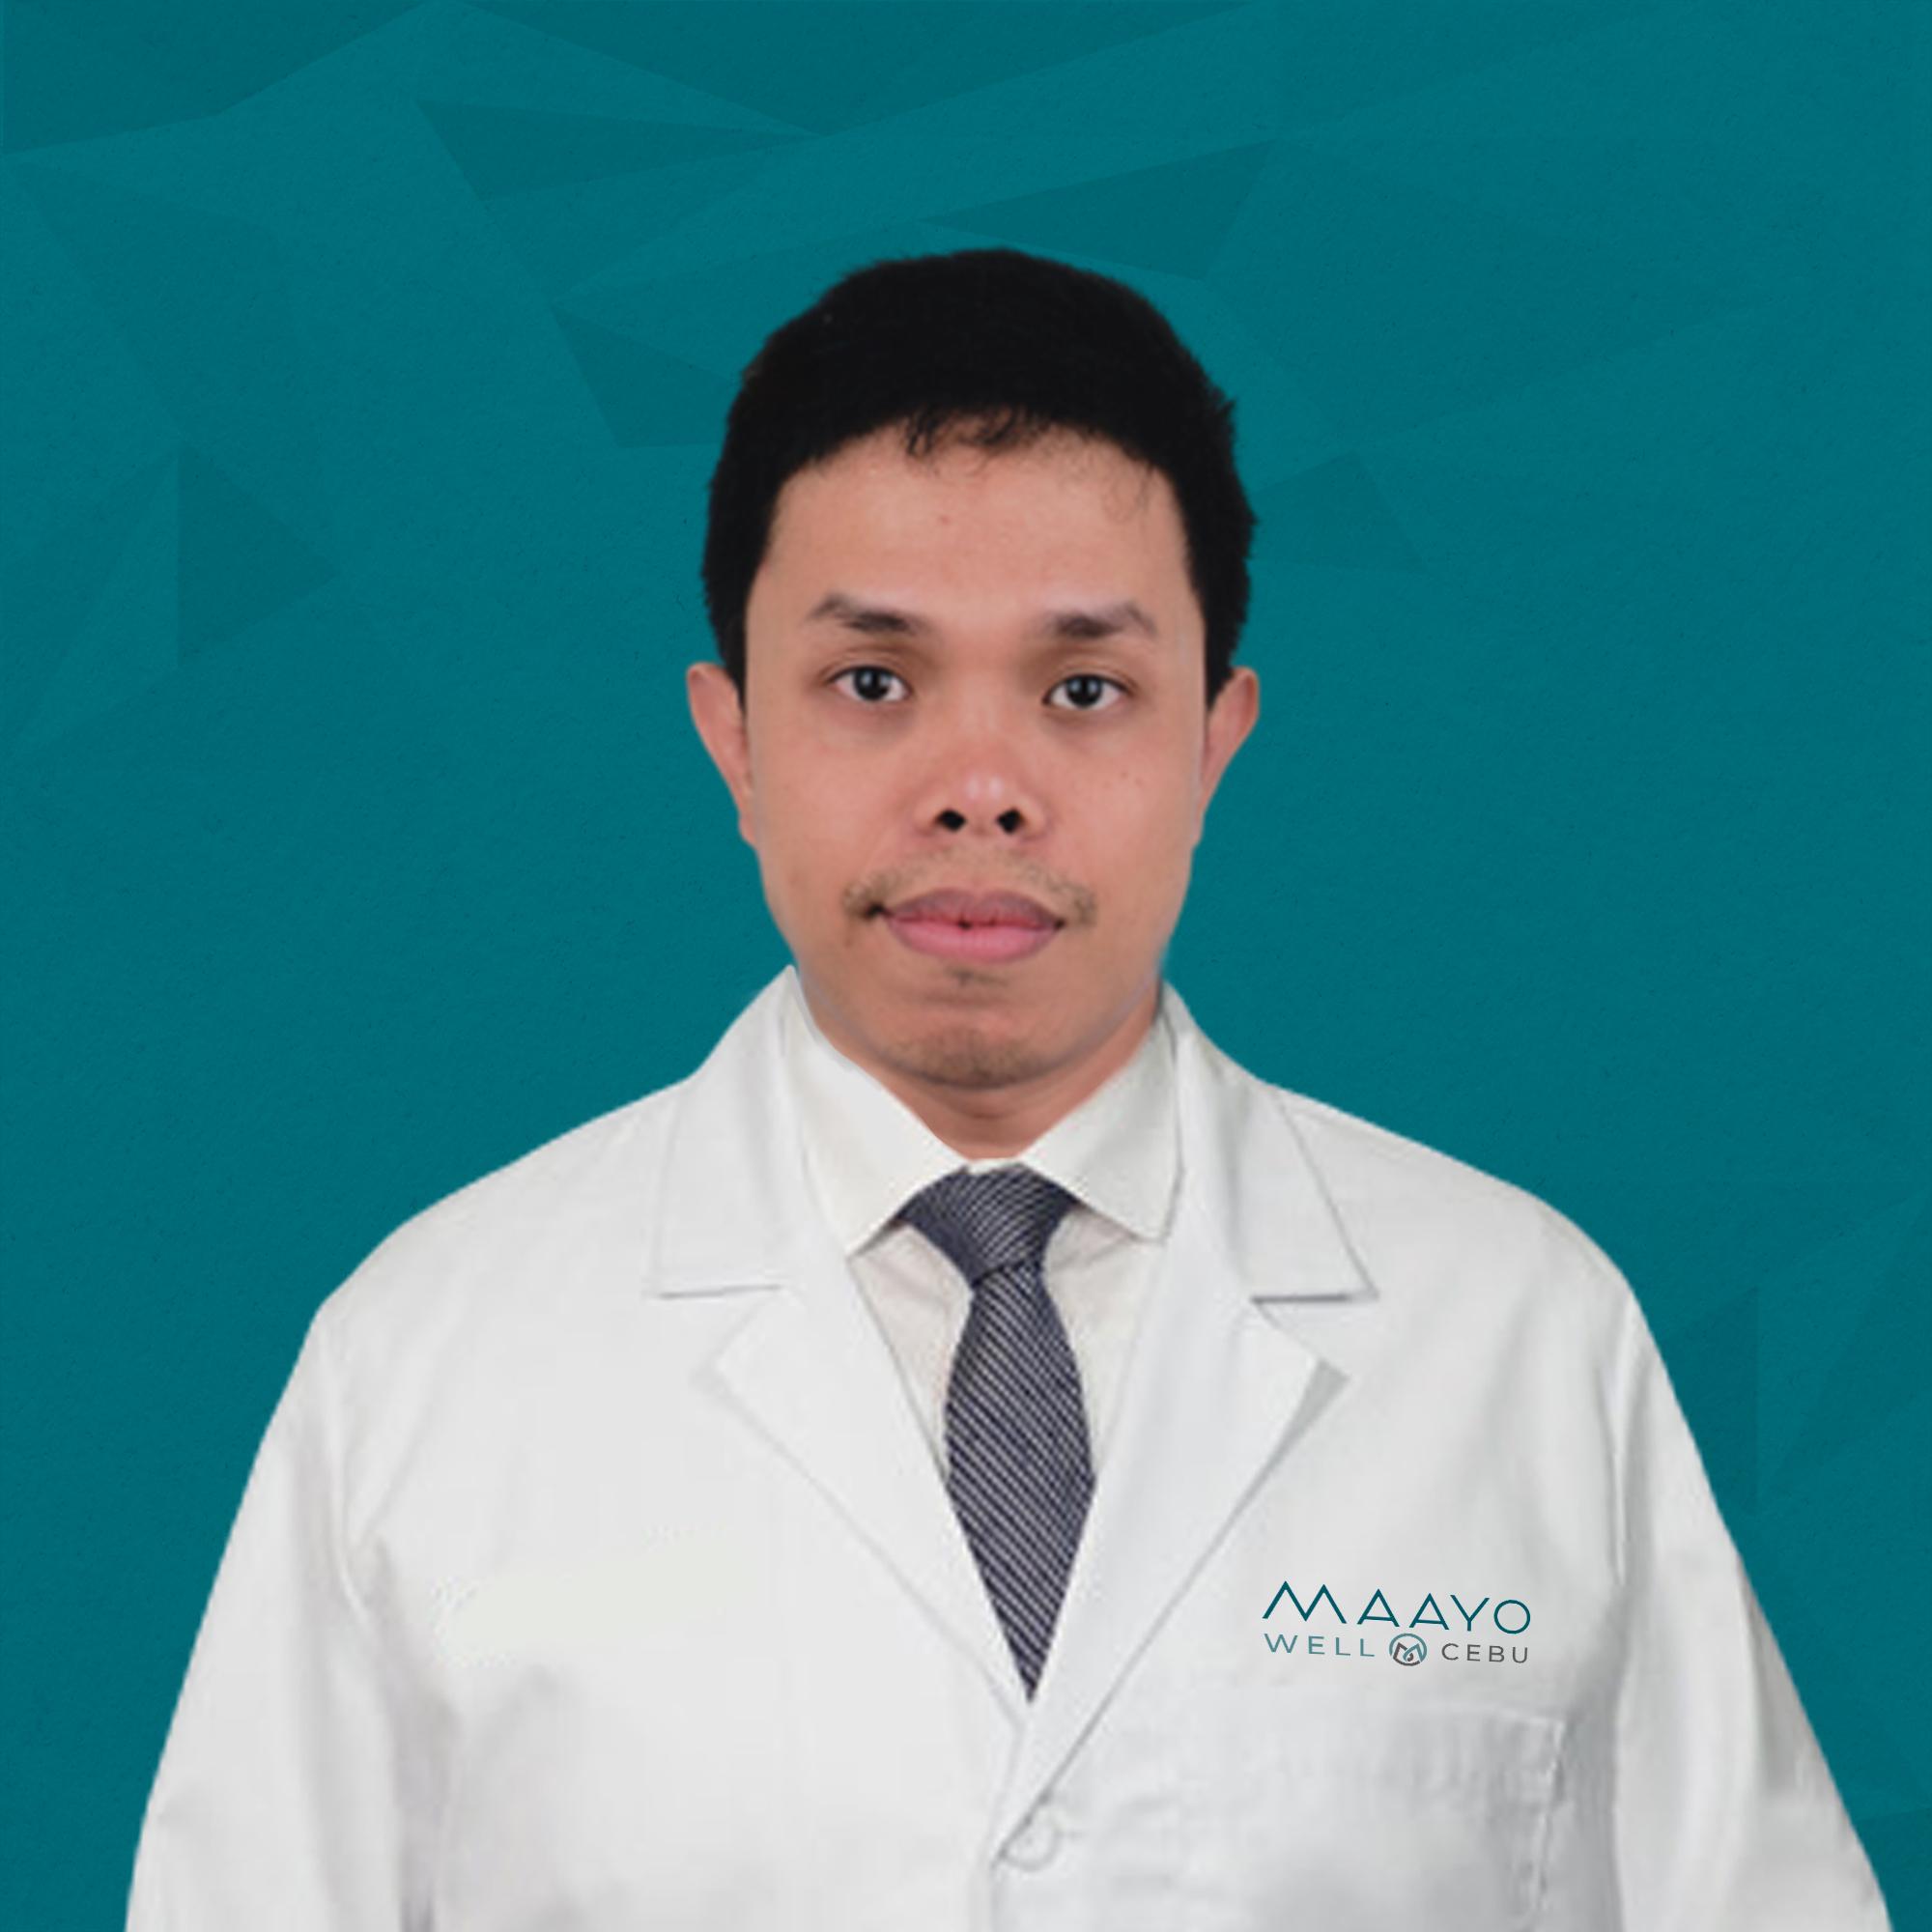 DR. TAMPUS, FREDERICK